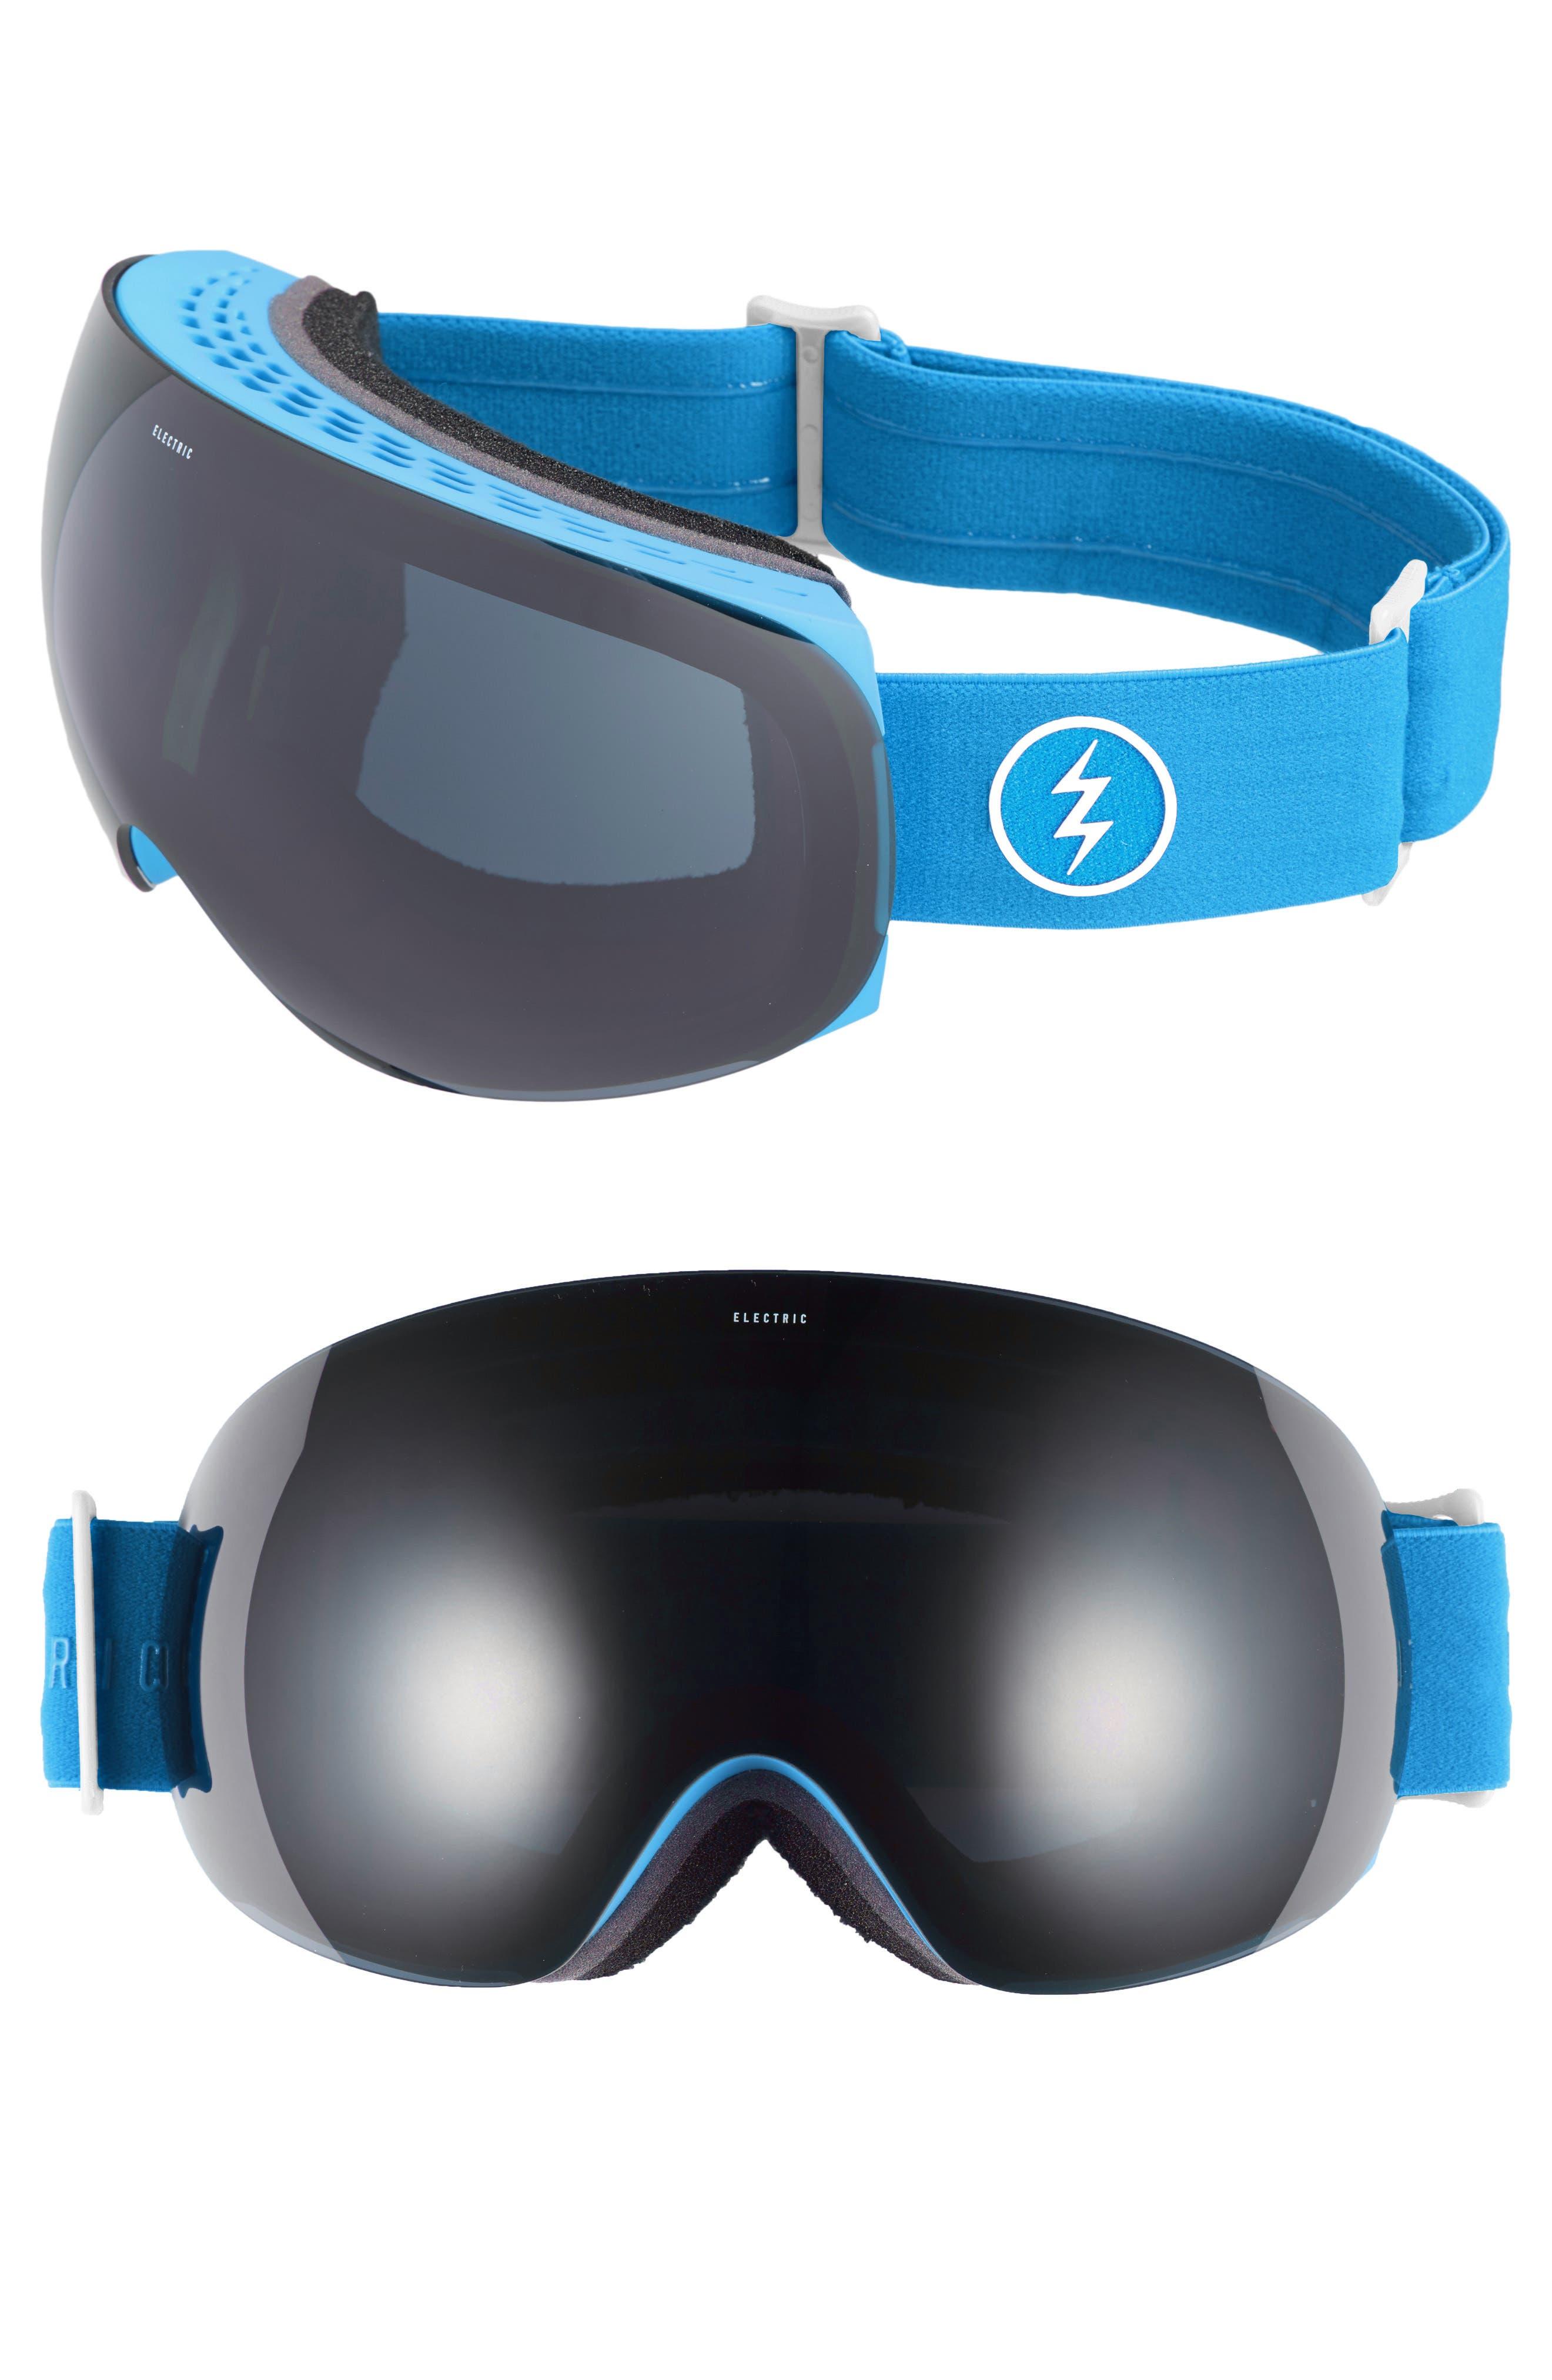 ELECTRIC EG3 254mm Snow Goggles